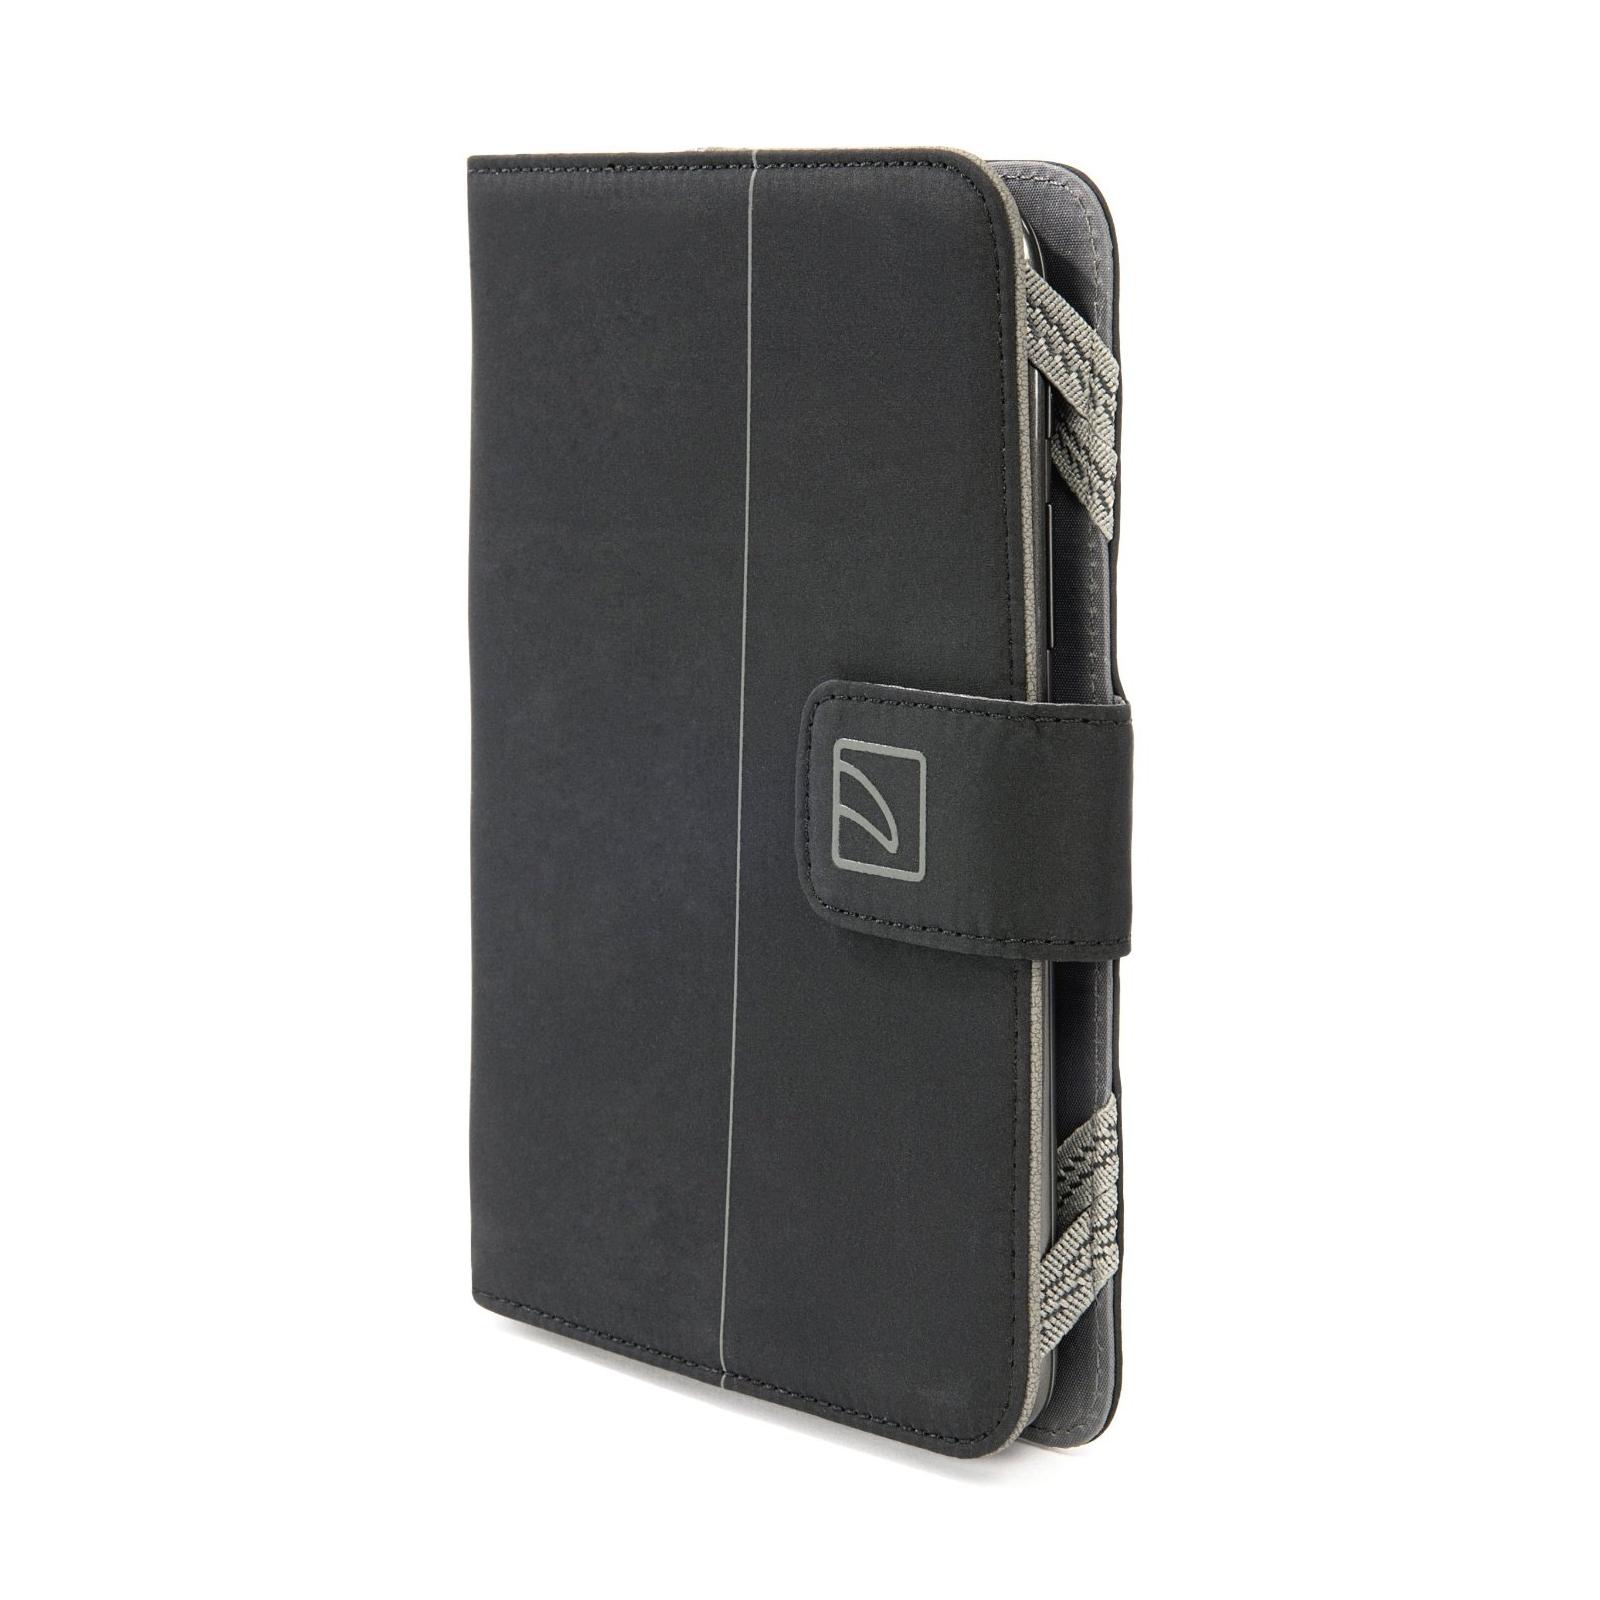 "Чехол для планшета Tucano 7"" Facile Stand Black (TAB-FA7) изображение 2"